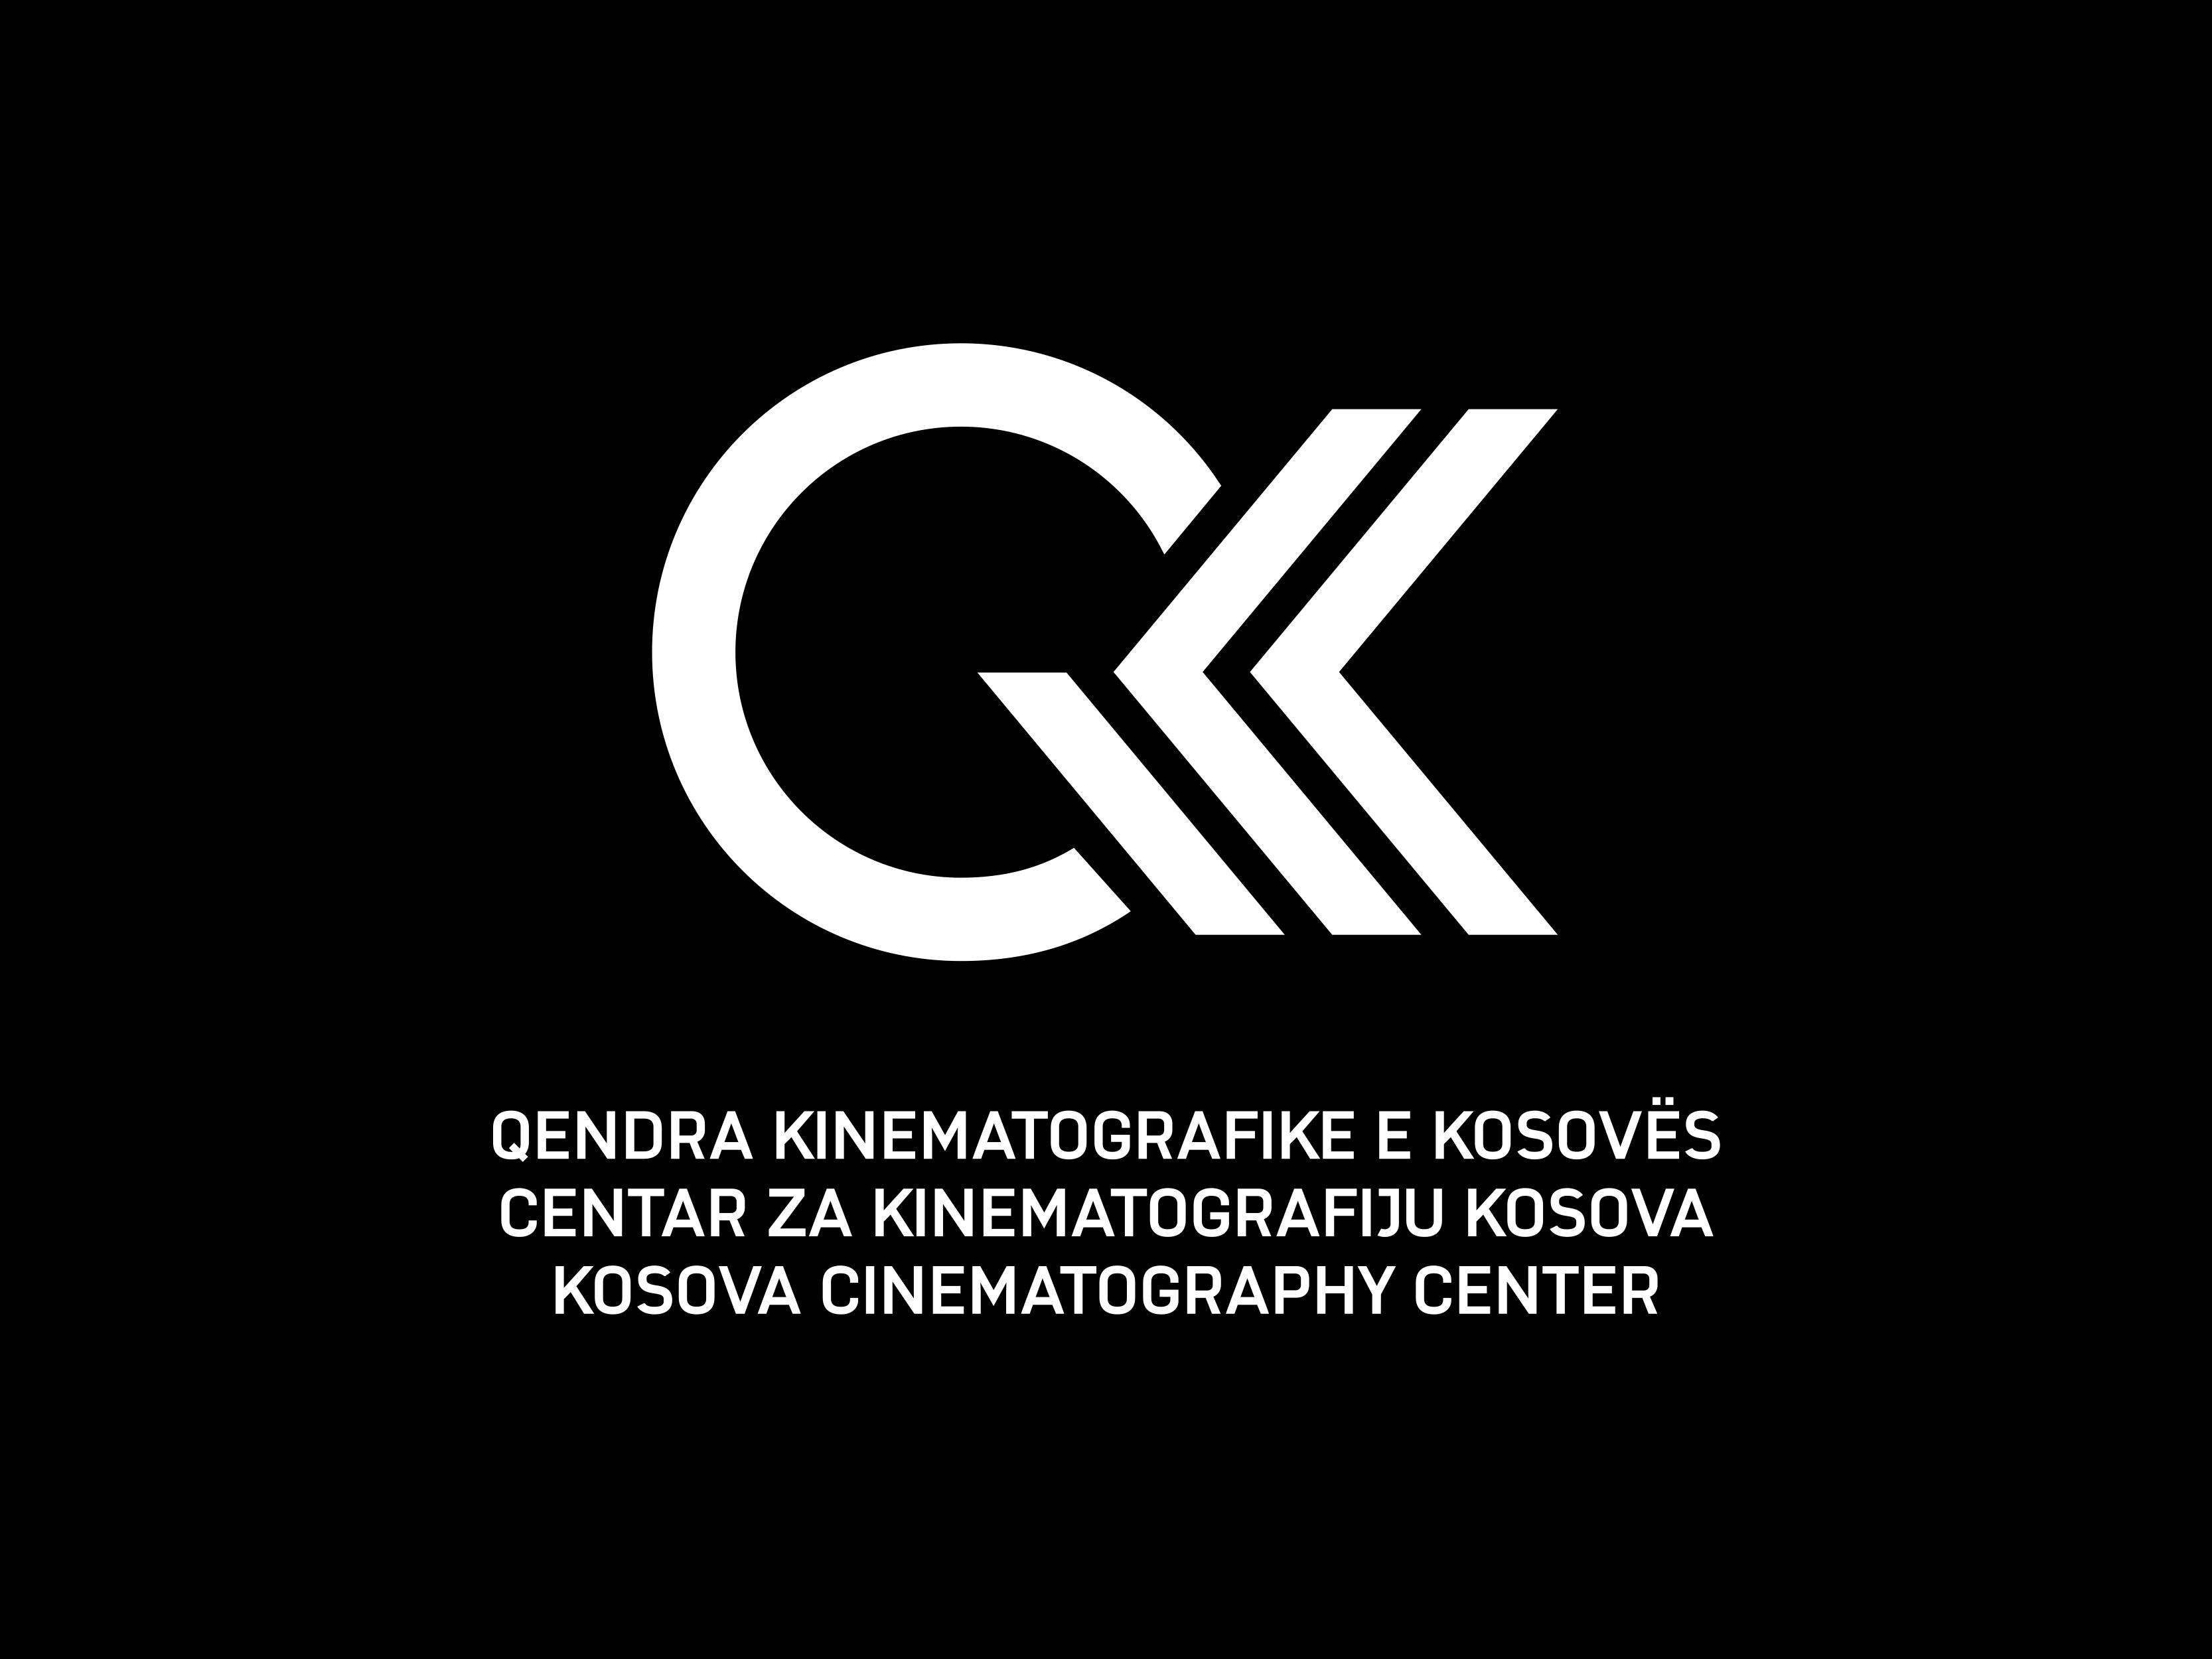 qkk_blackBG